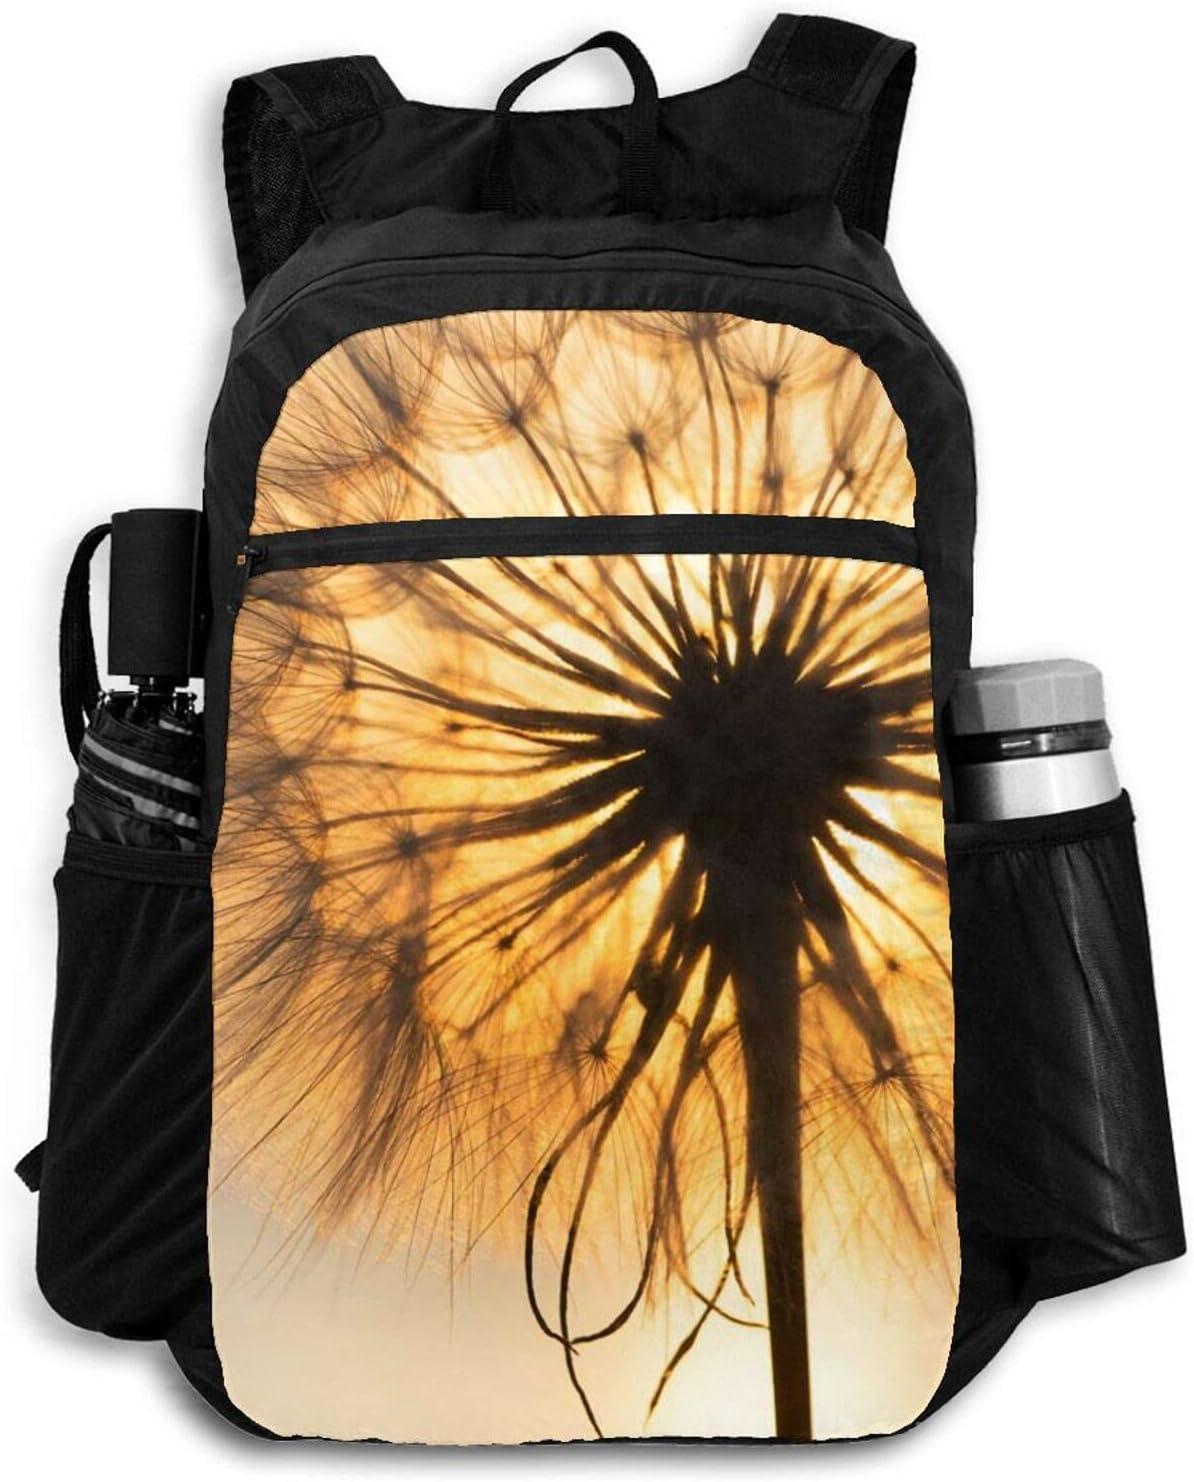 Year-end annual account Zolama Dandelion Silhouette Backpacks for Boston Mall Cute Men Packabl Women